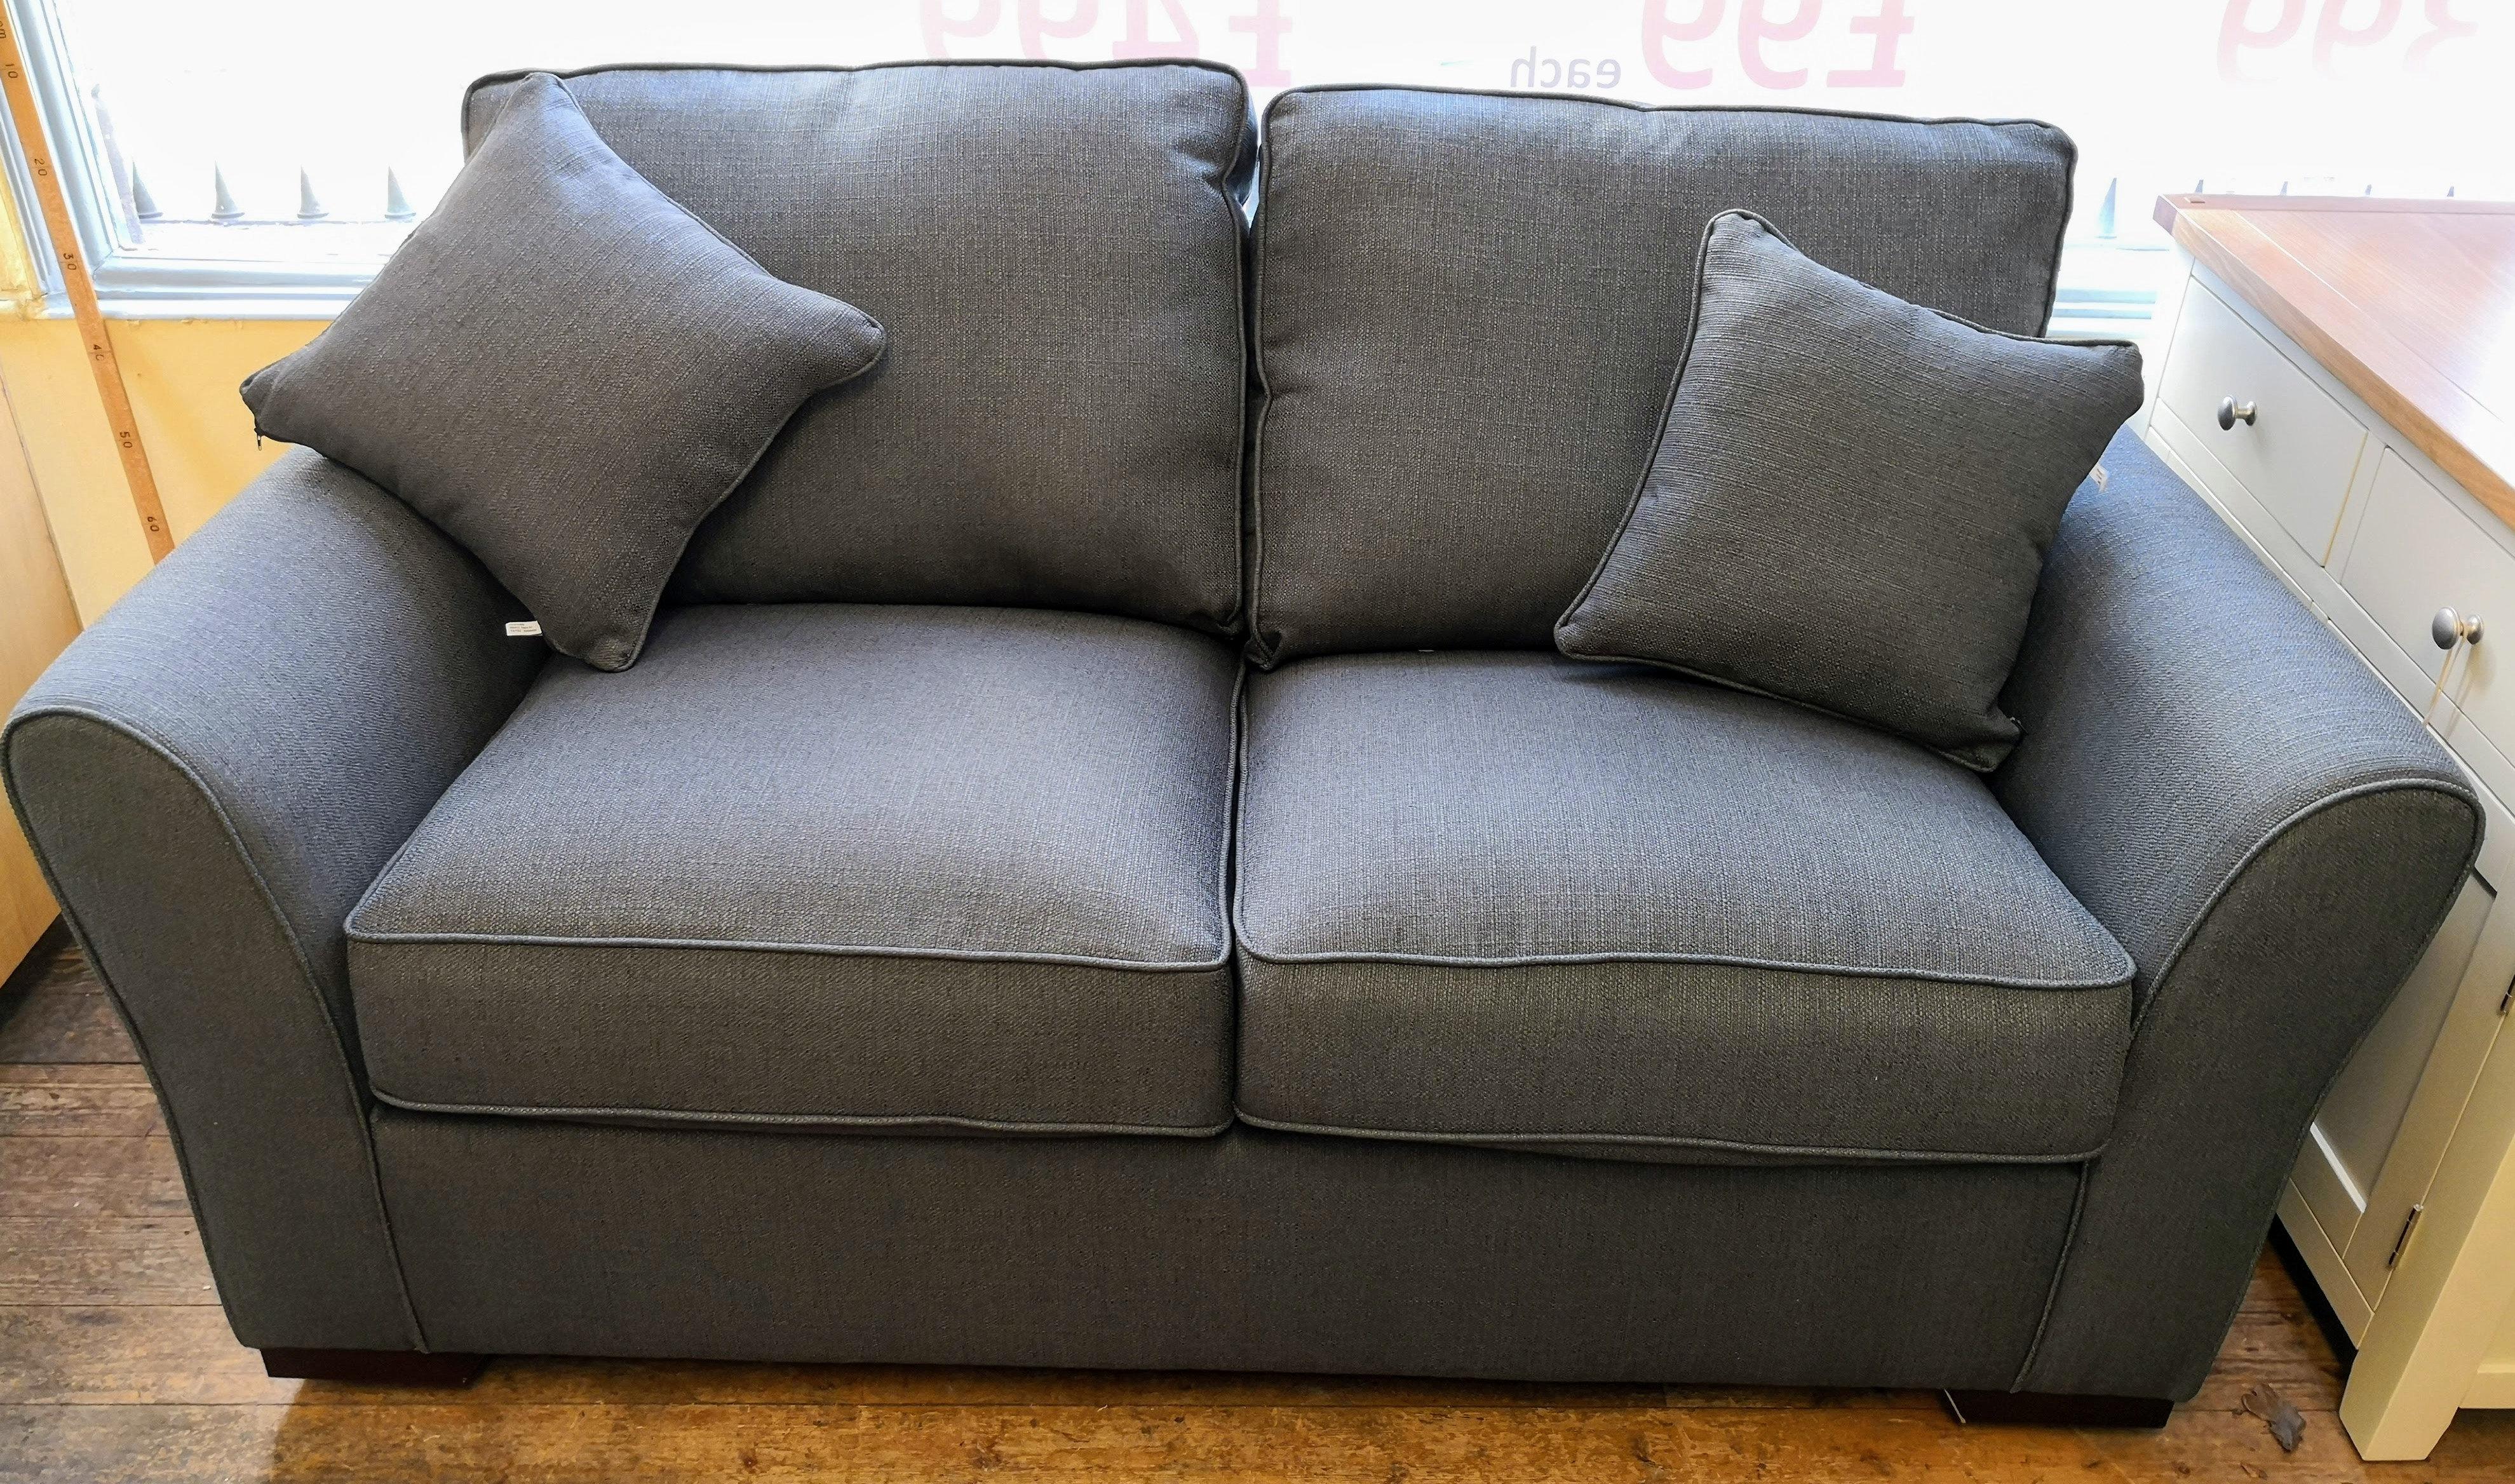 Chester - 3 Seater Sofa SALE